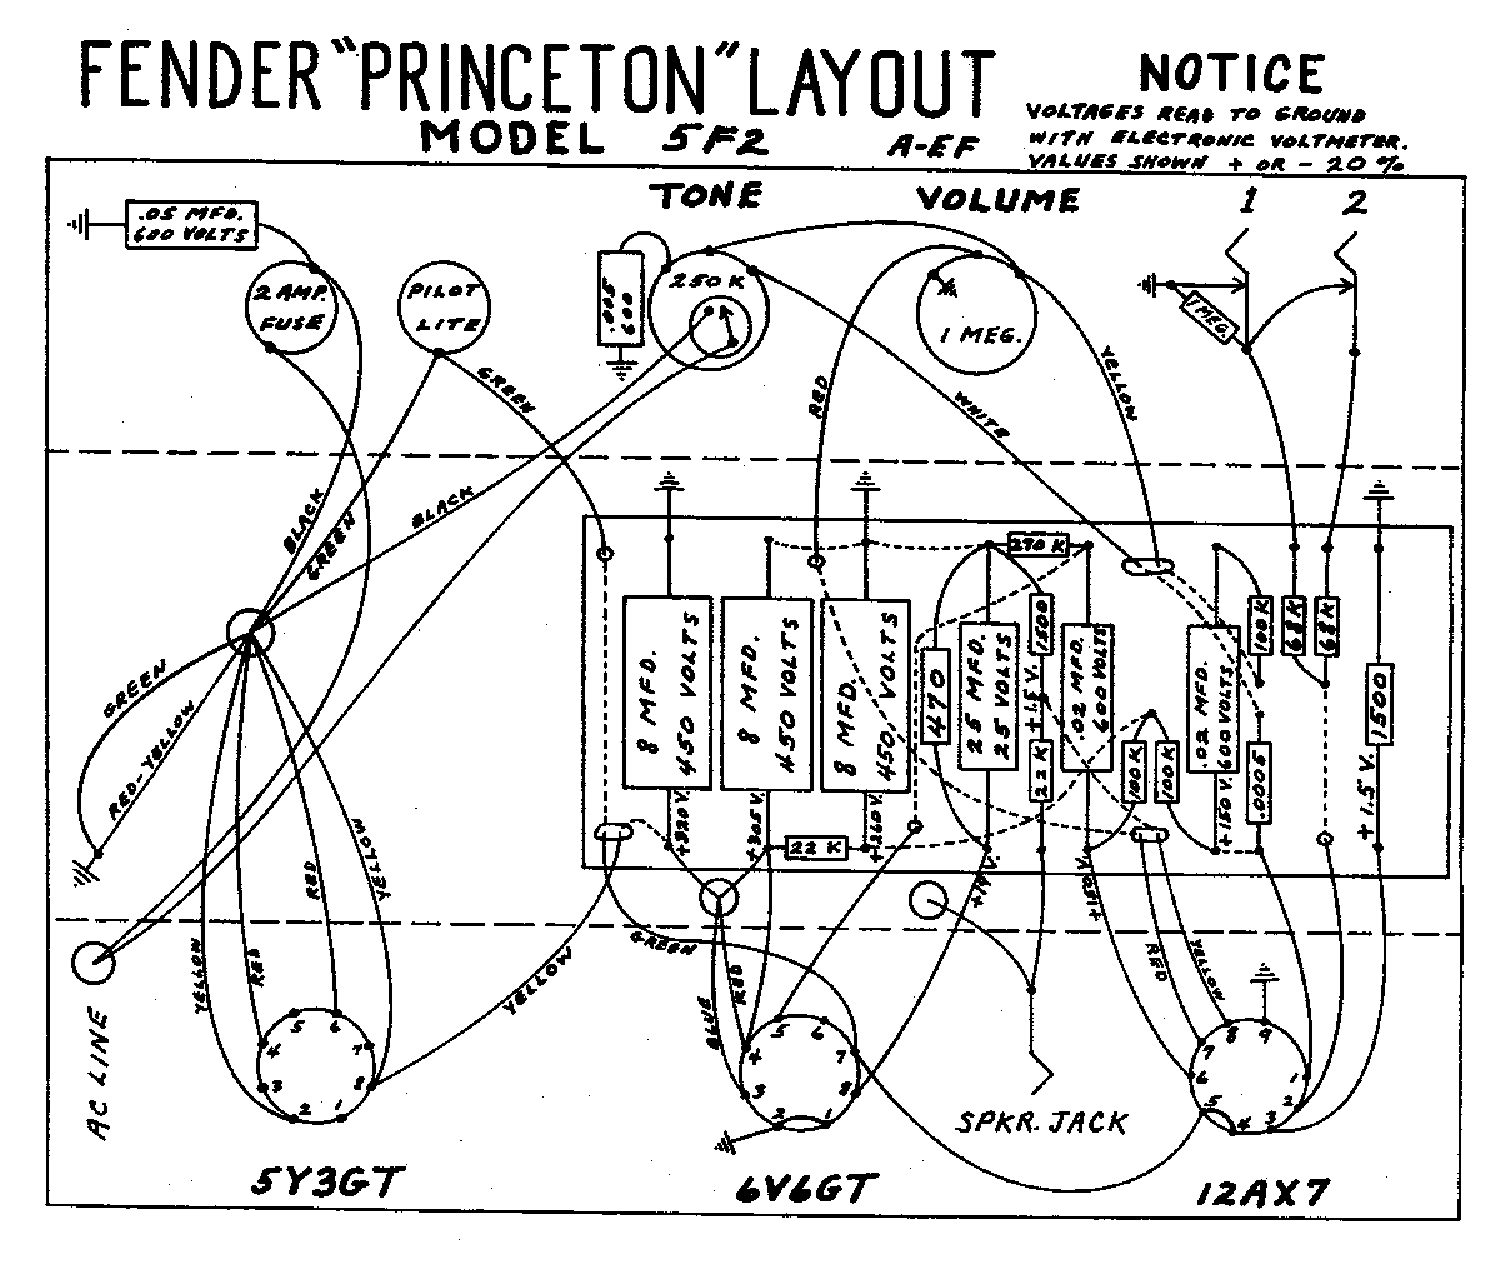 FENDER PRINCETON 5F2 LAYOUT Service Manual 1st Page